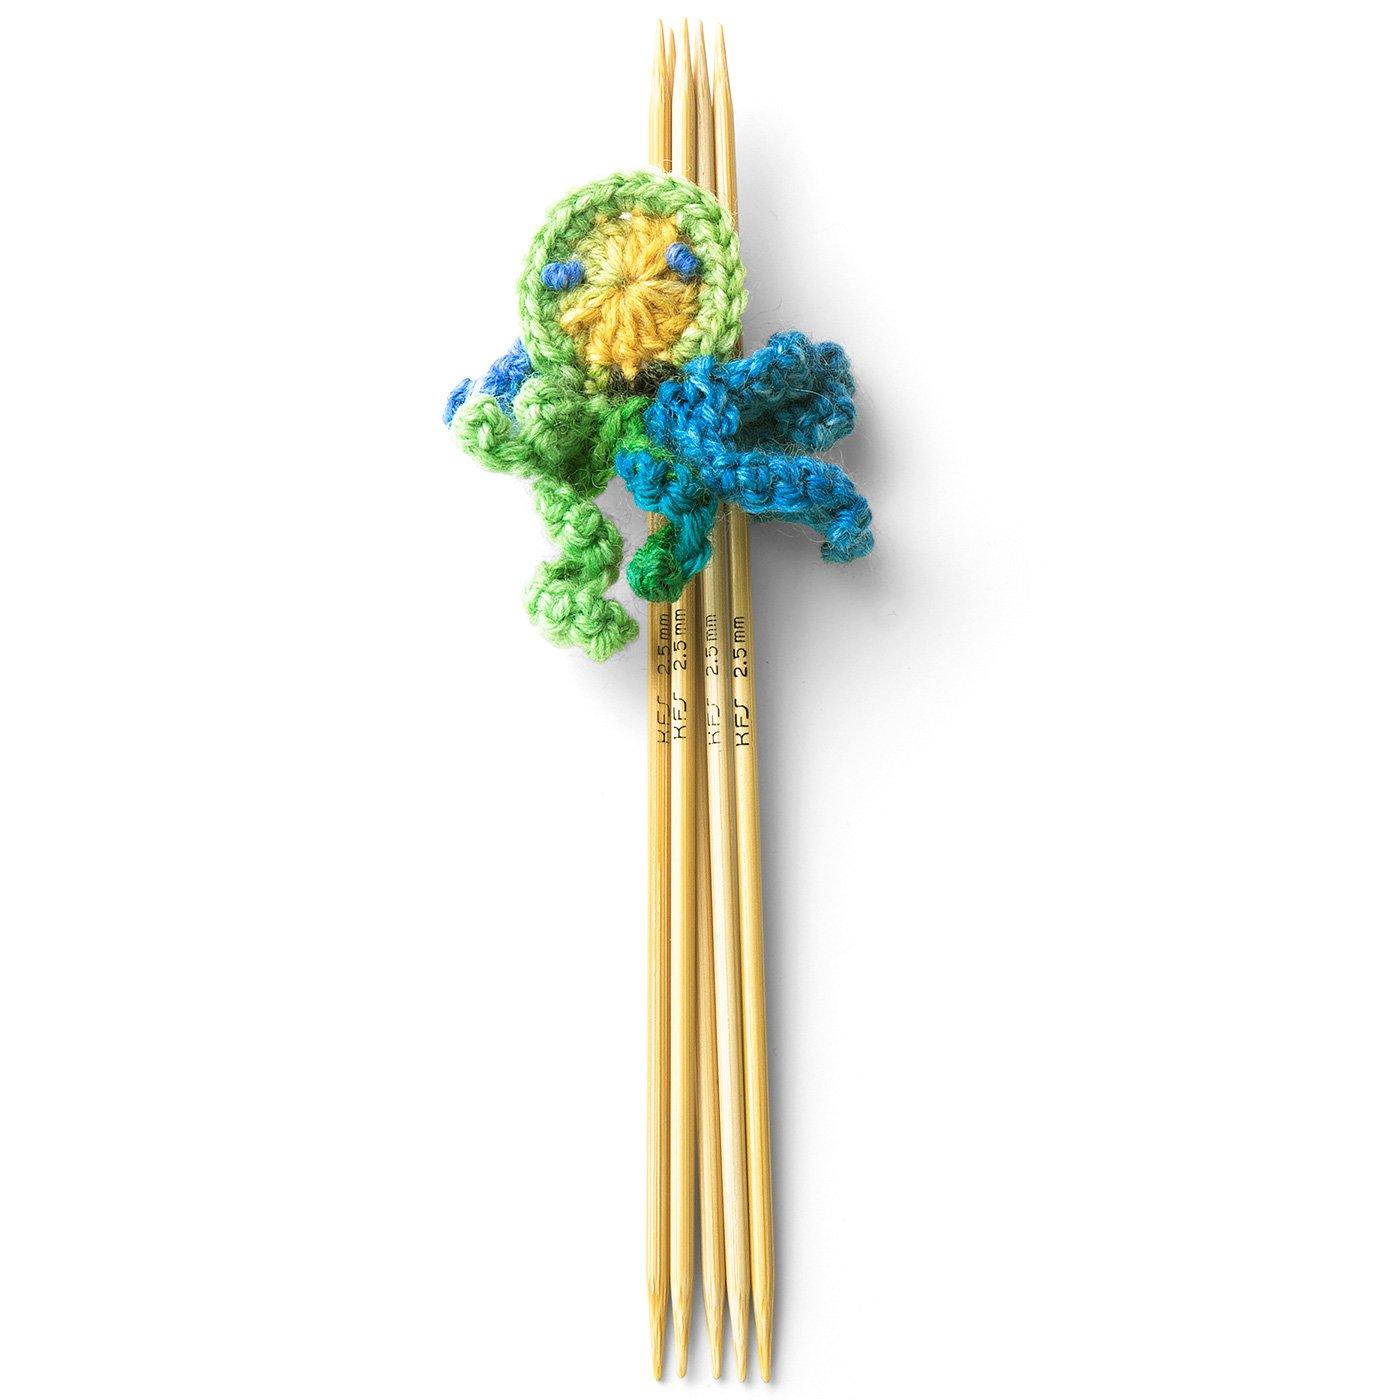 Opal毛糸のための5本棒針